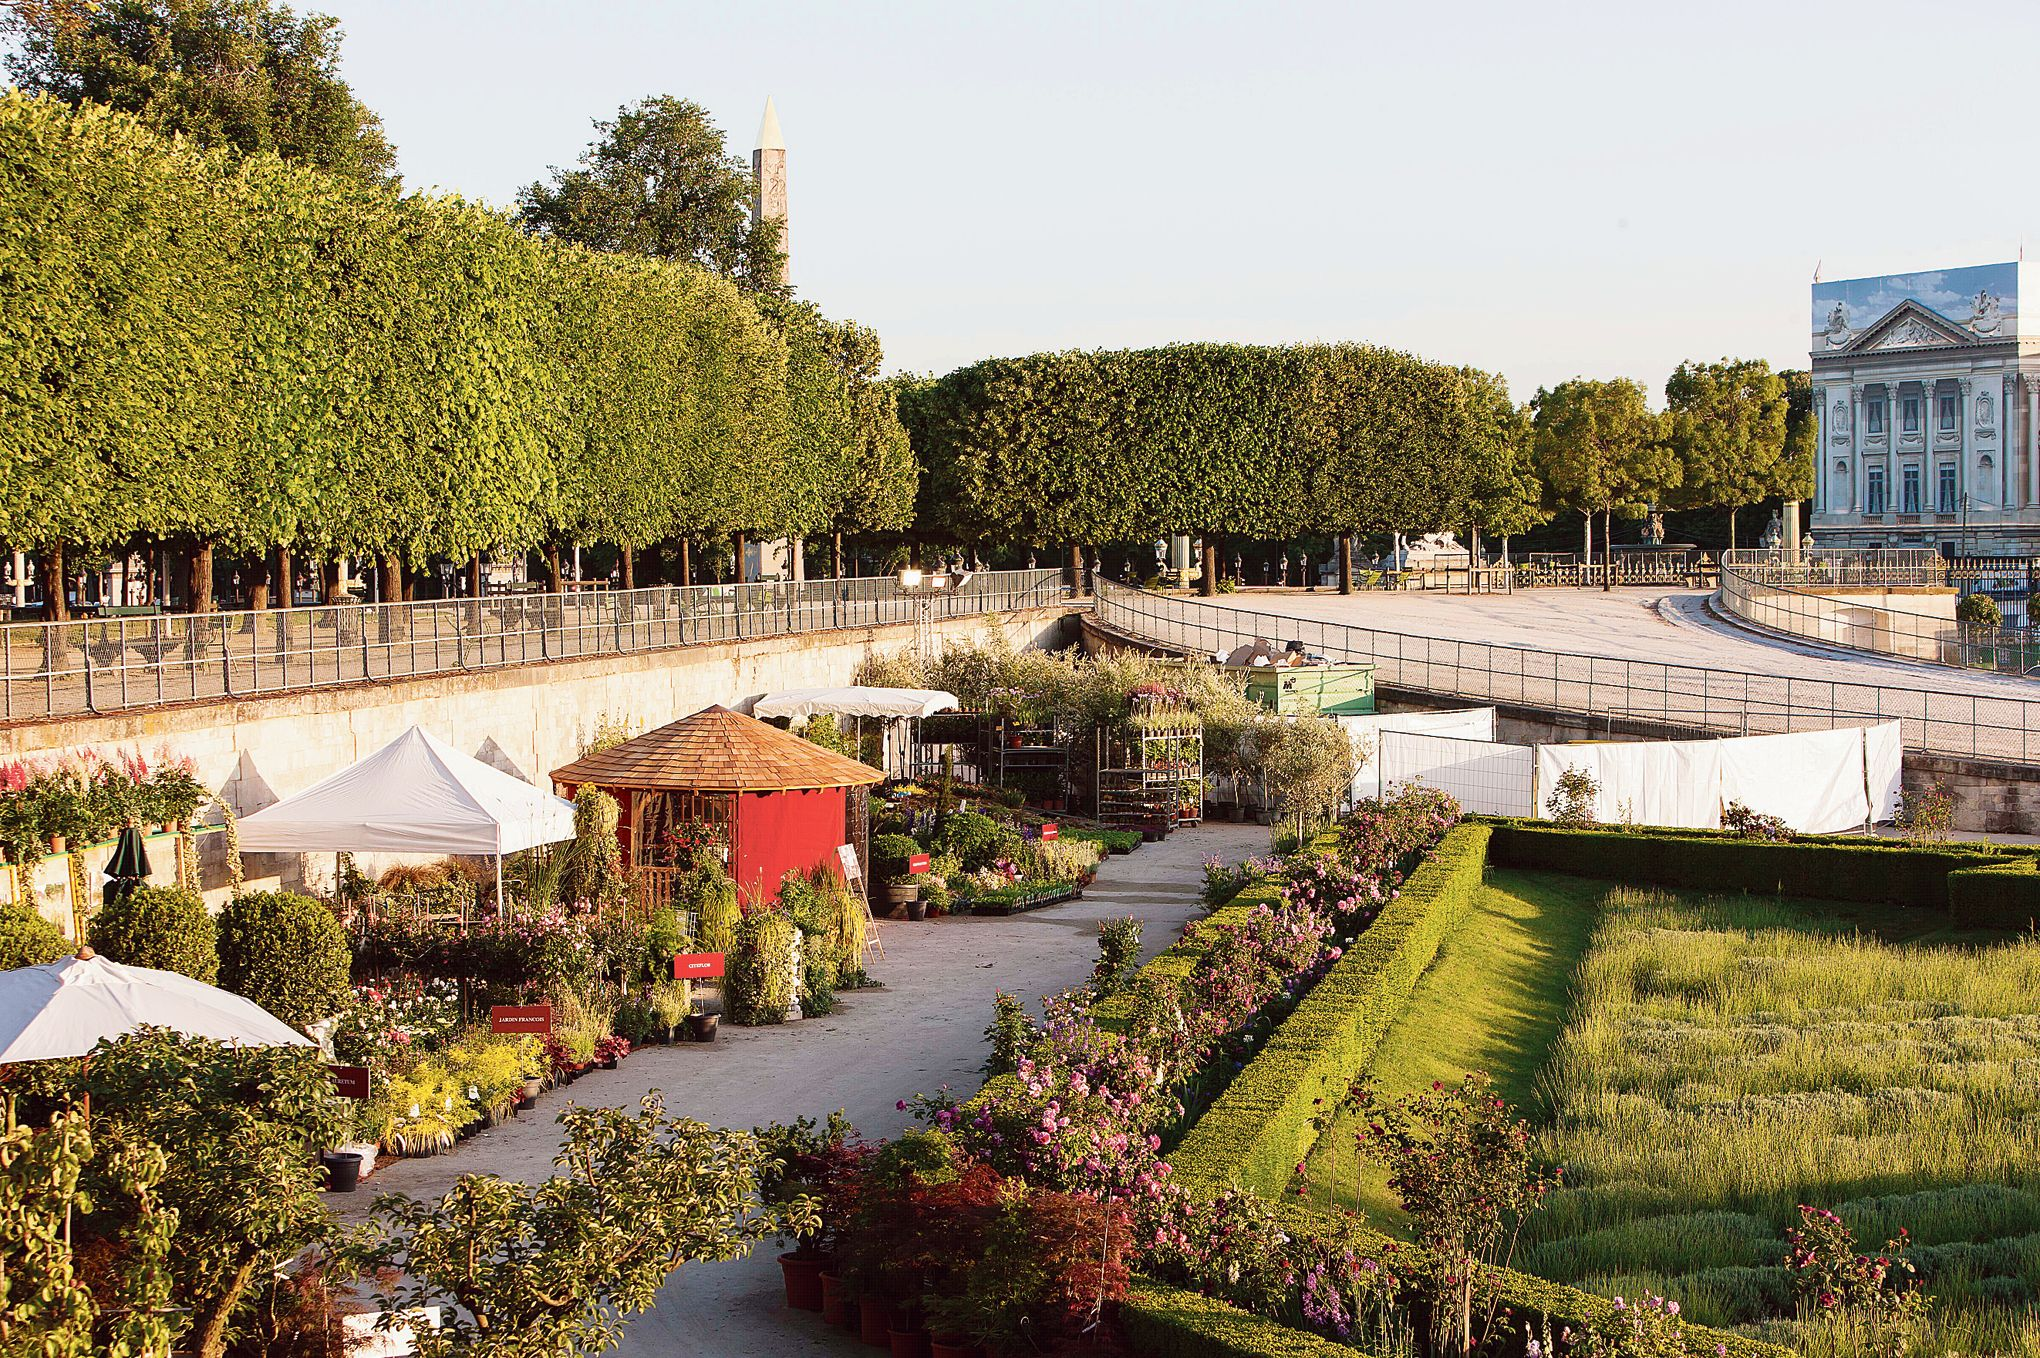 Jardins jardin aux tuileries la cit passe au vert for Jardin aux tuileries